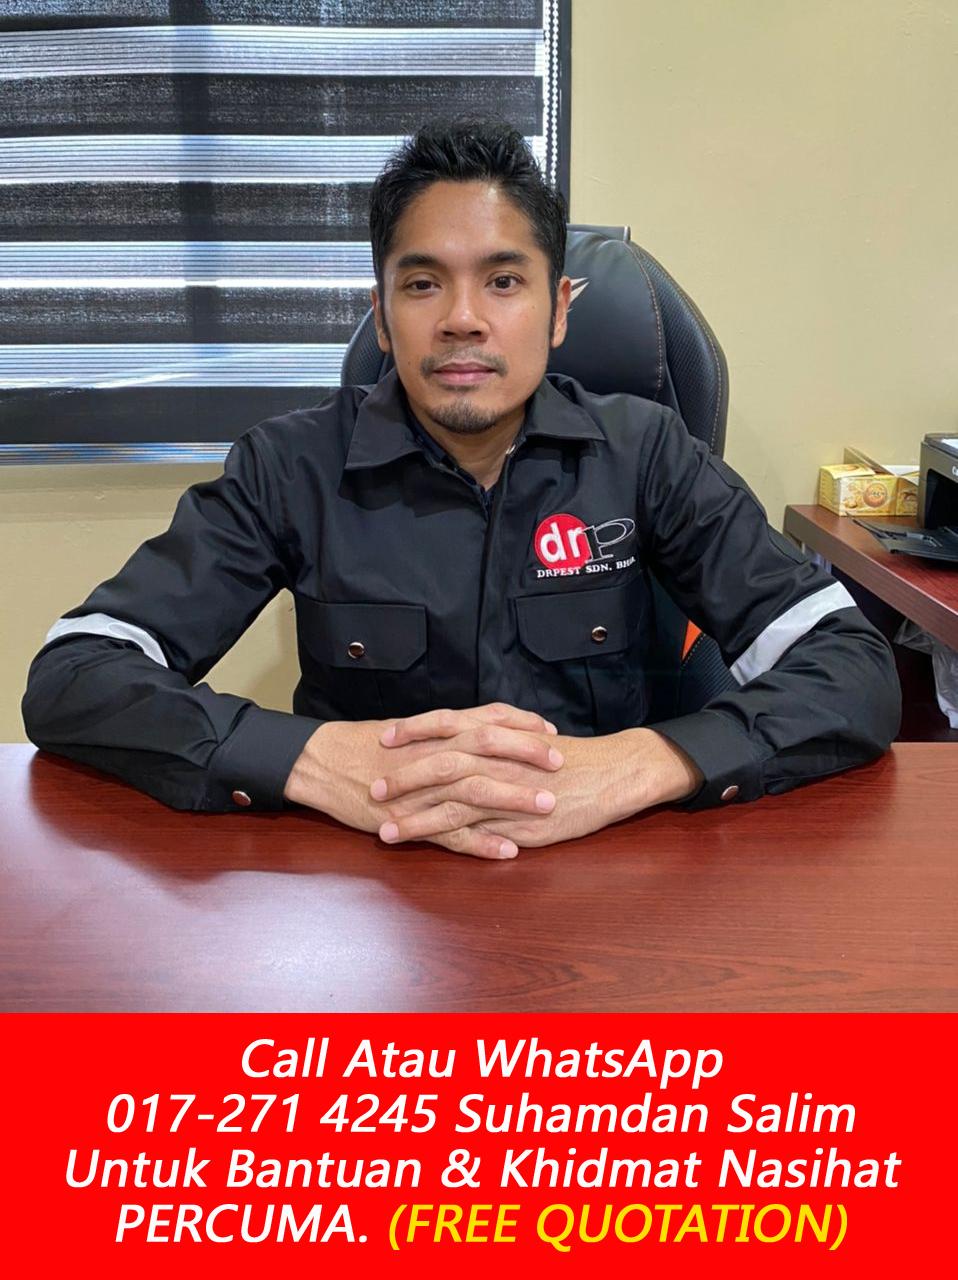 drpest sdn bhd drp maintenance and services syarikat kawalan serangga bumiputra yang berlesen the best company pest control near me area Bukit Nanas kl near me